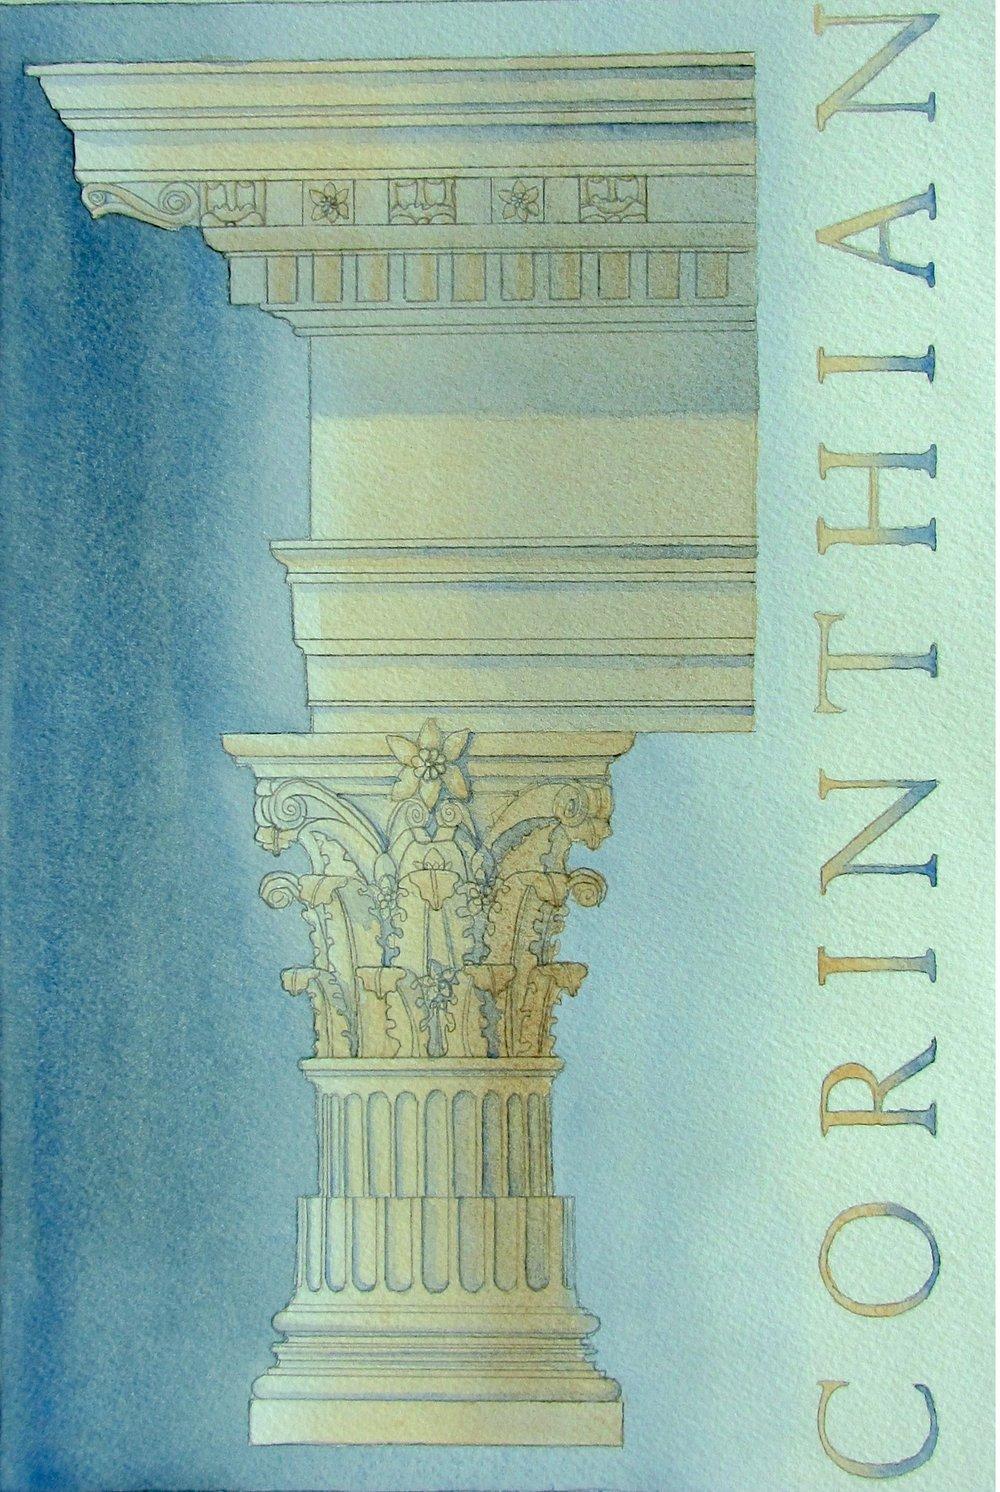 Corinthian Column - Artwork by Rebecca Noll